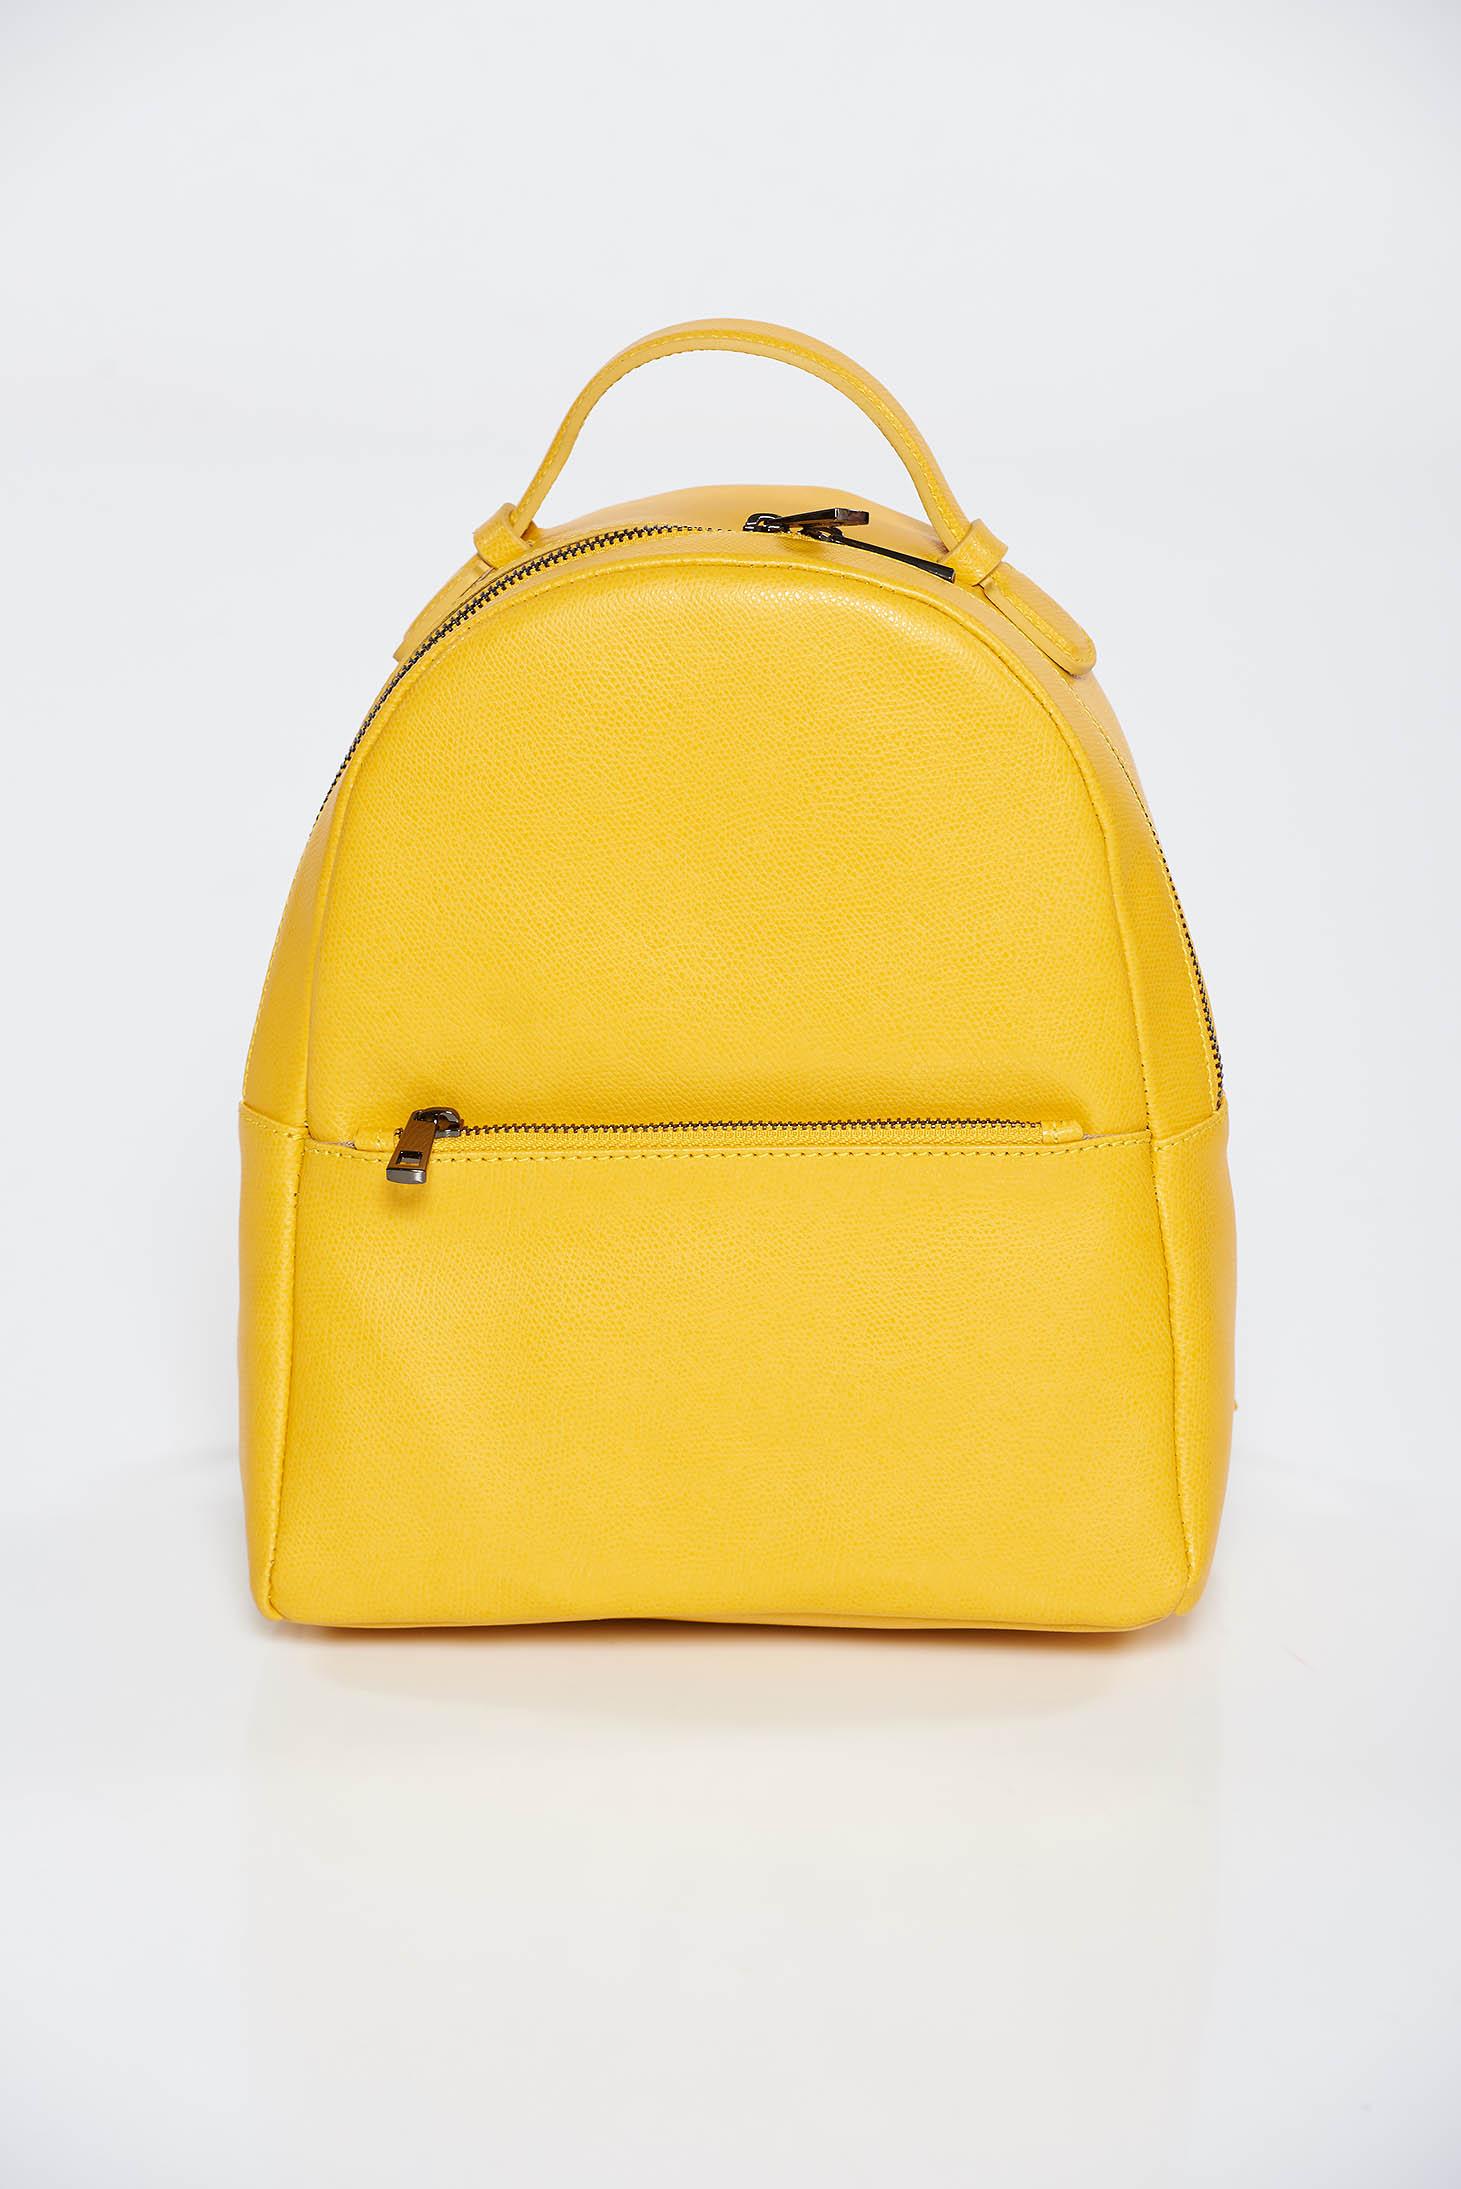 Rucsac galben casual din piele naturala cu bretele ajustabile si fermoare